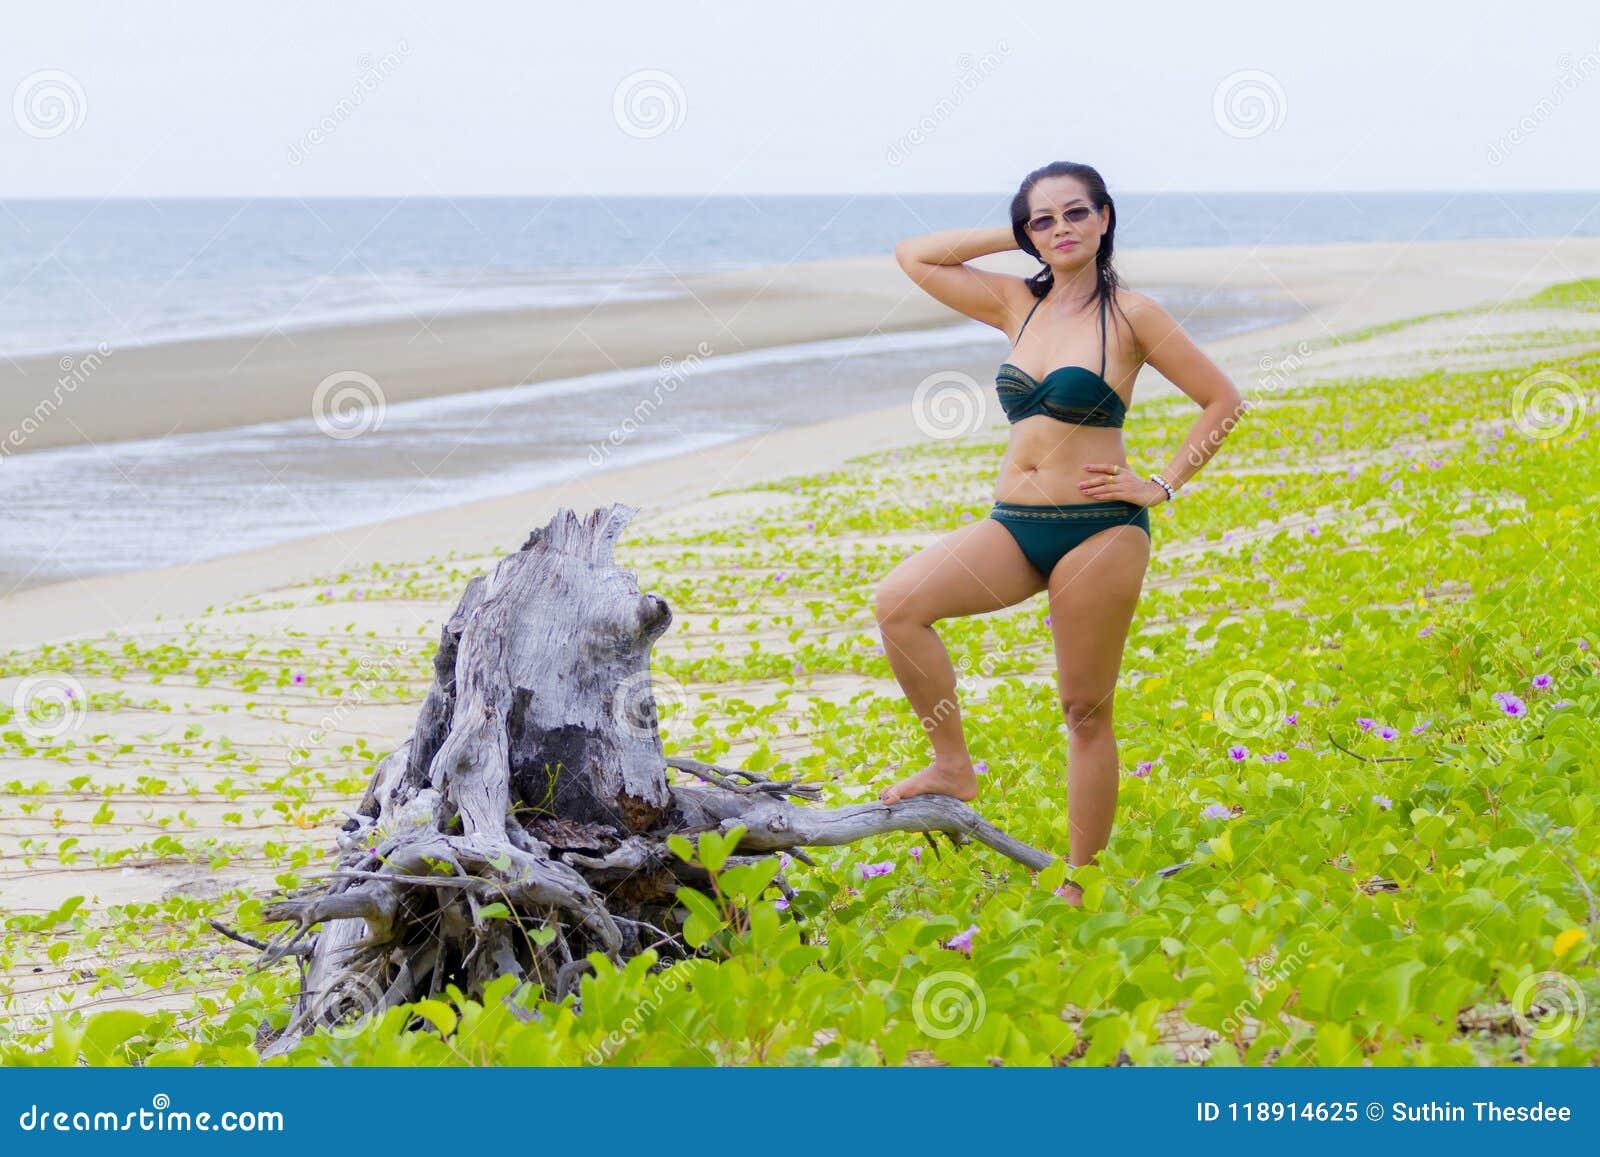 c3558bf01ae Woman shape with bikini beautiful on nature beach Tap Skea, Prachuap  Khirikhan Province Thailand